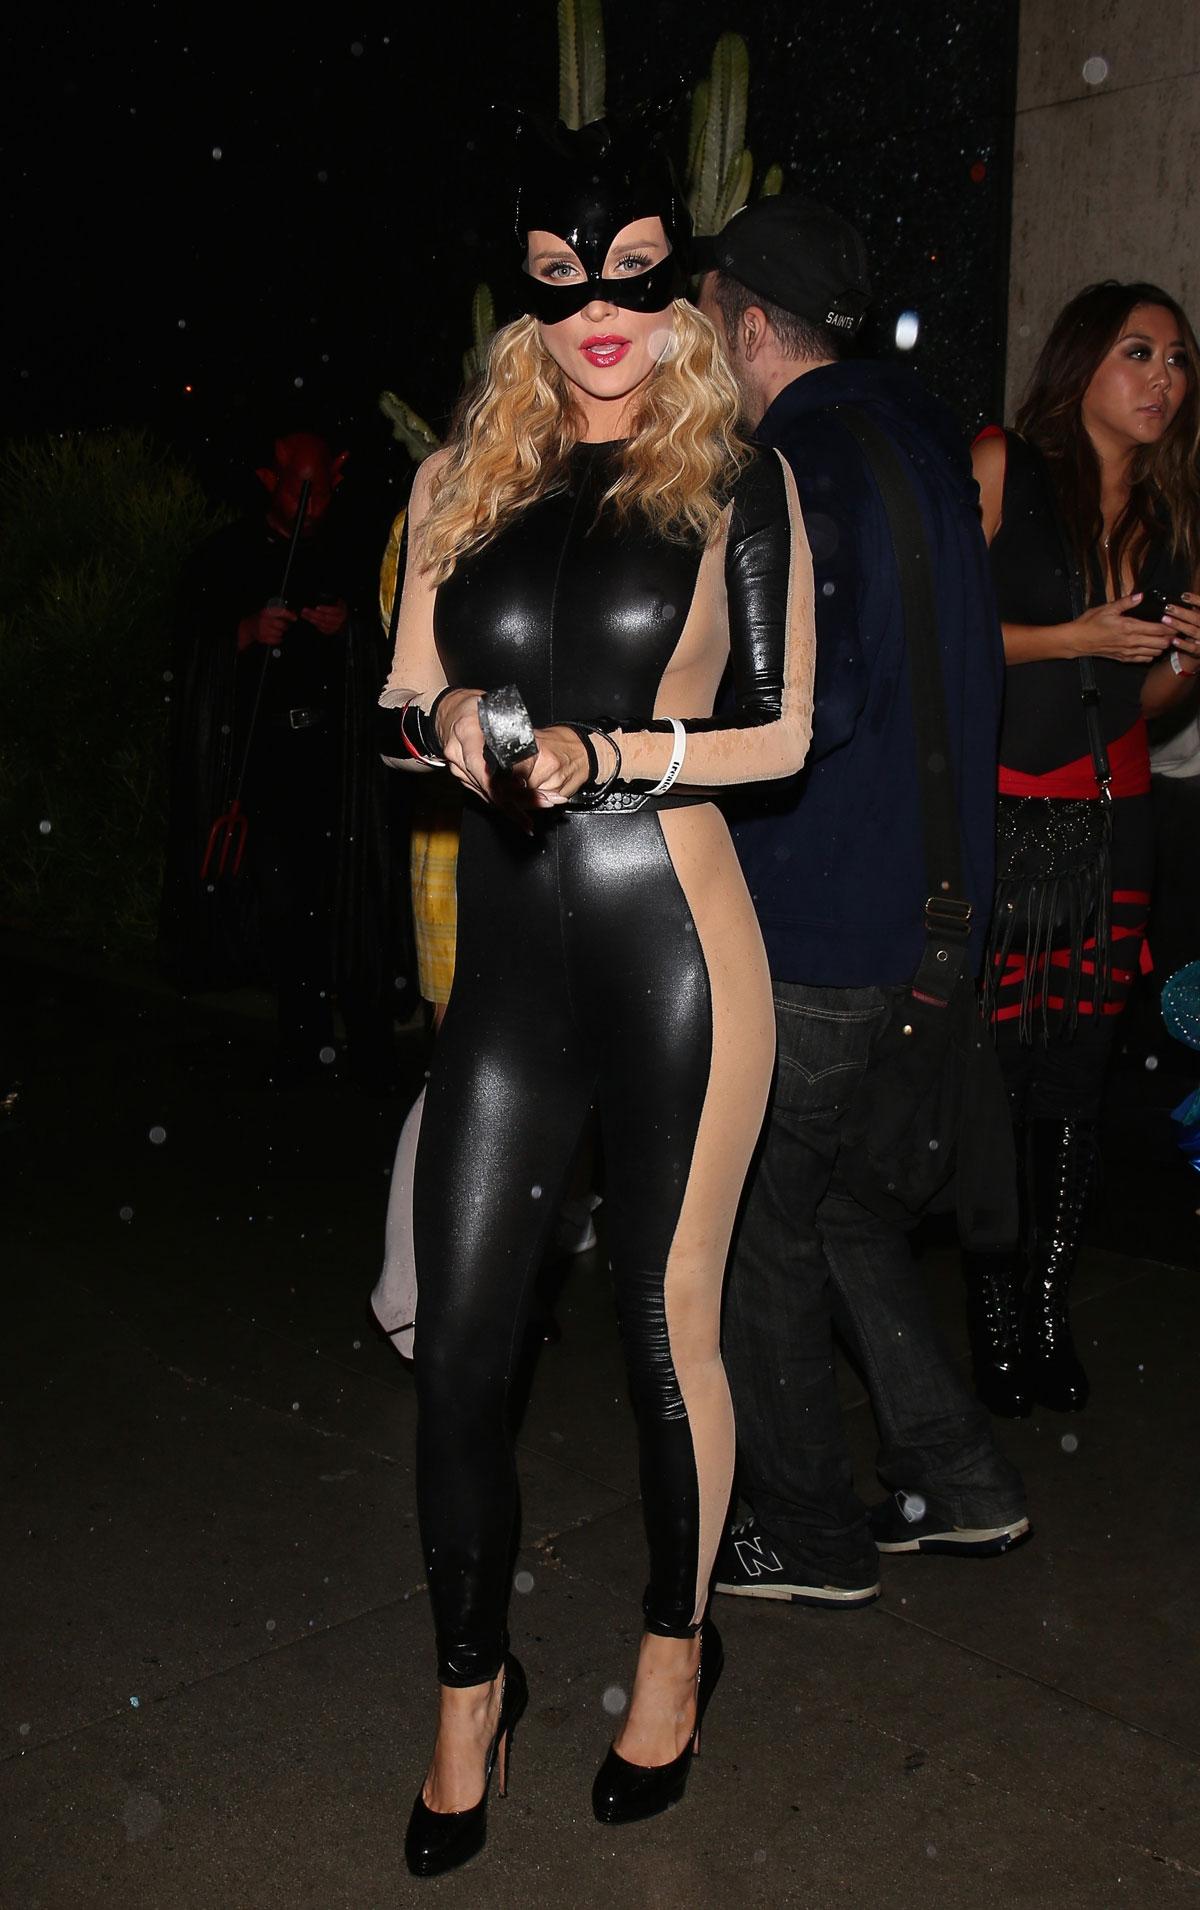 Joanna Krupa attends Halloween Party